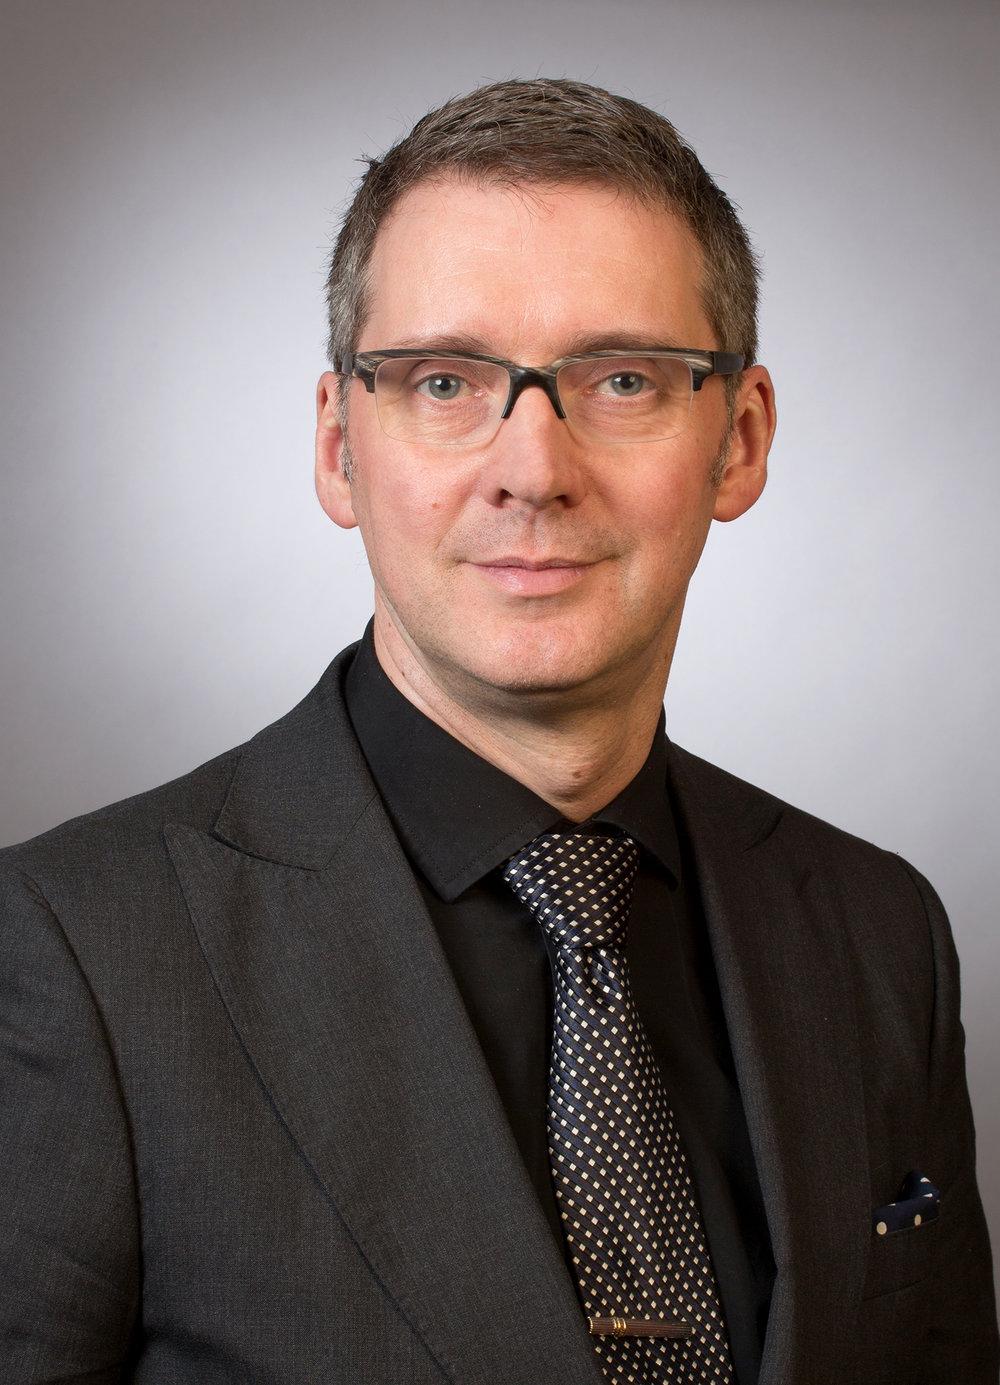 Martin Cowie